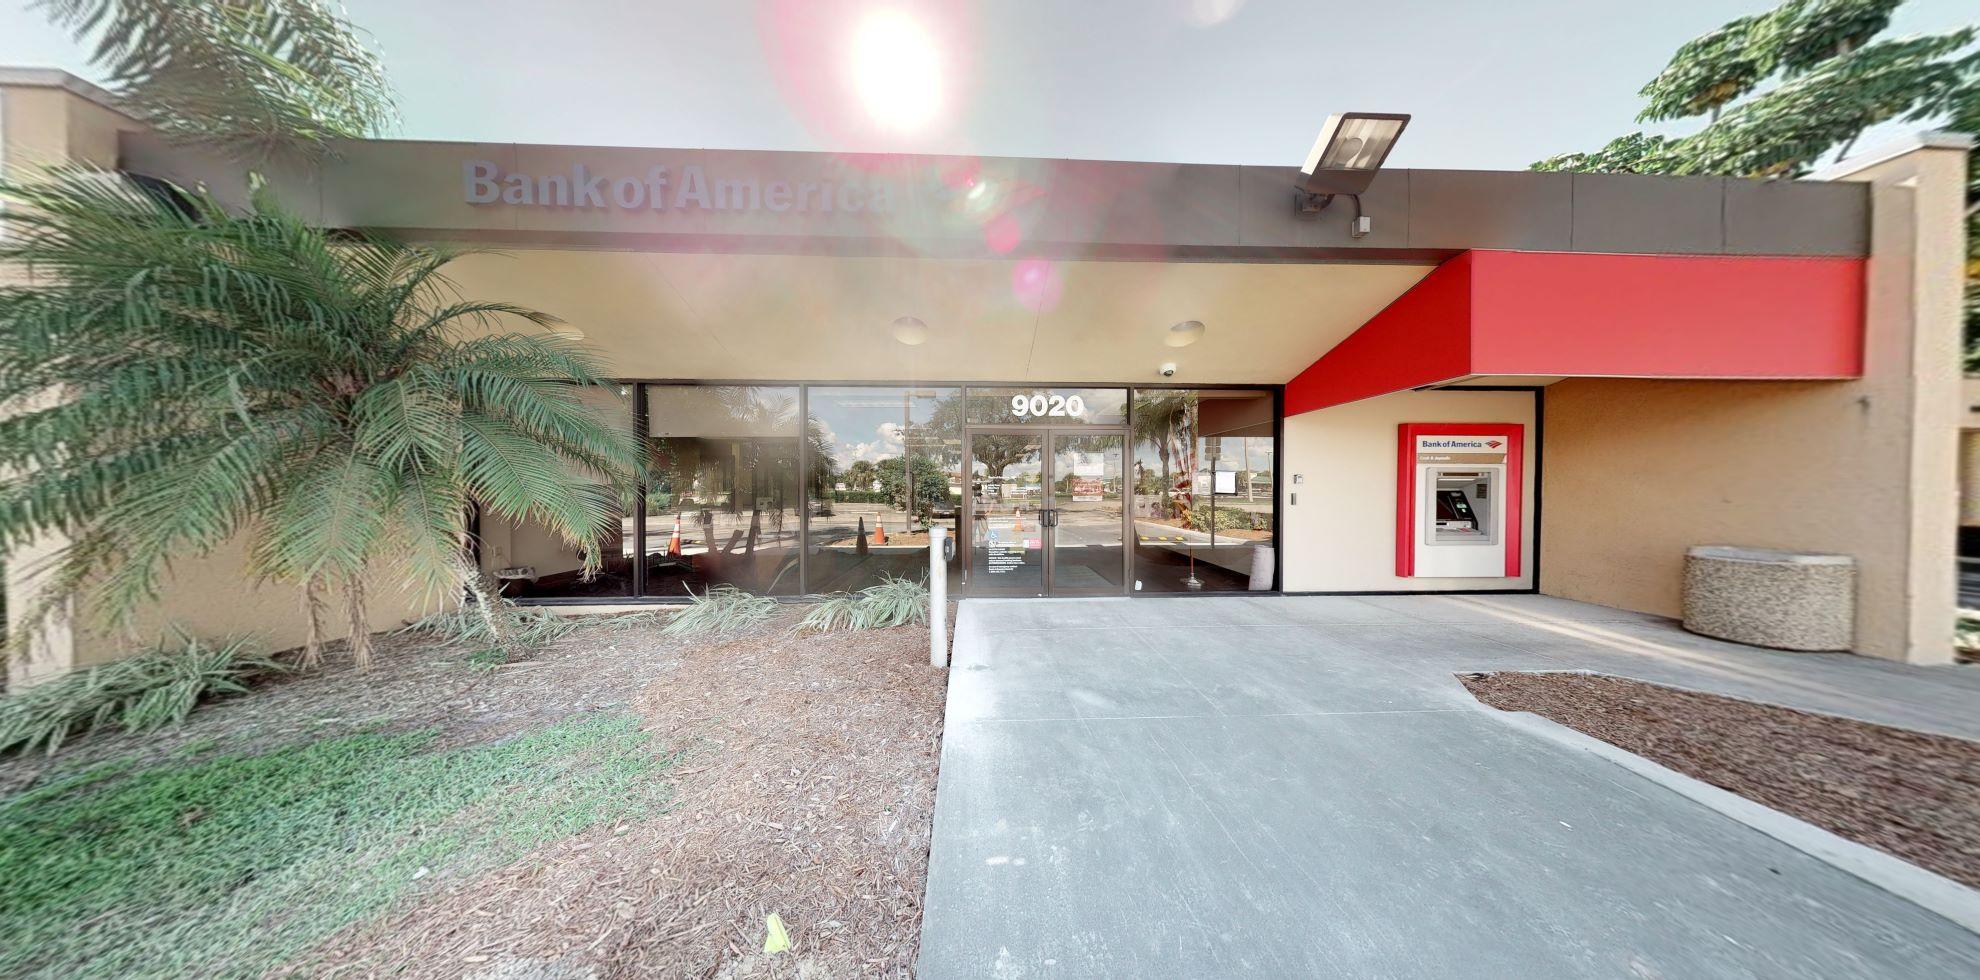 Bank of America financial center with drive-thru ATM | 9020 Bonita Beach Rd SE, Bonita Springs, FL 34135